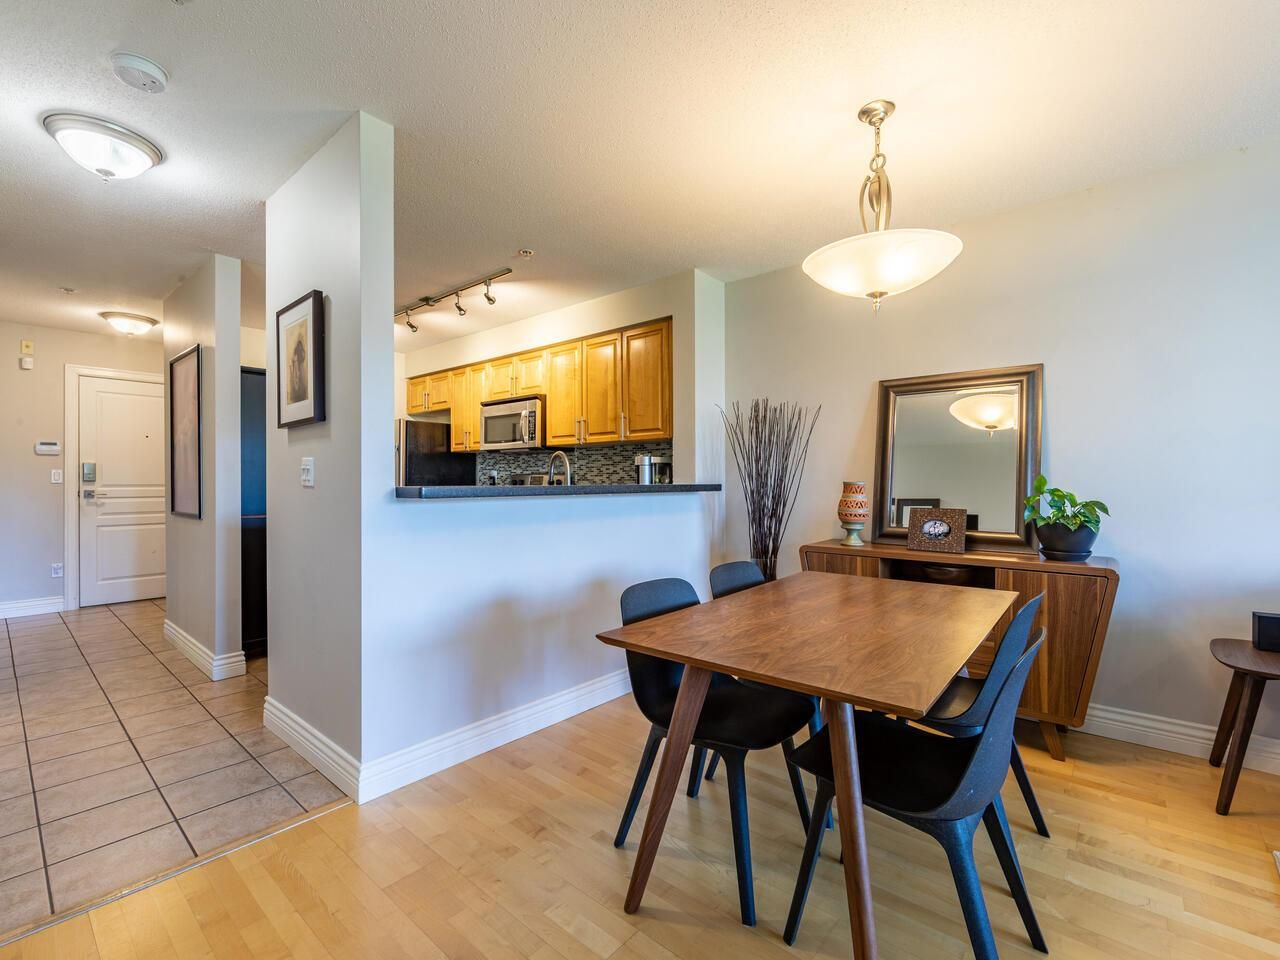 "Photo 9: Photos: 226 5800 ANDREWS Road in Richmond: Steveston South Condo for sale in ""THE VILLAS"" : MLS®# R2569641"